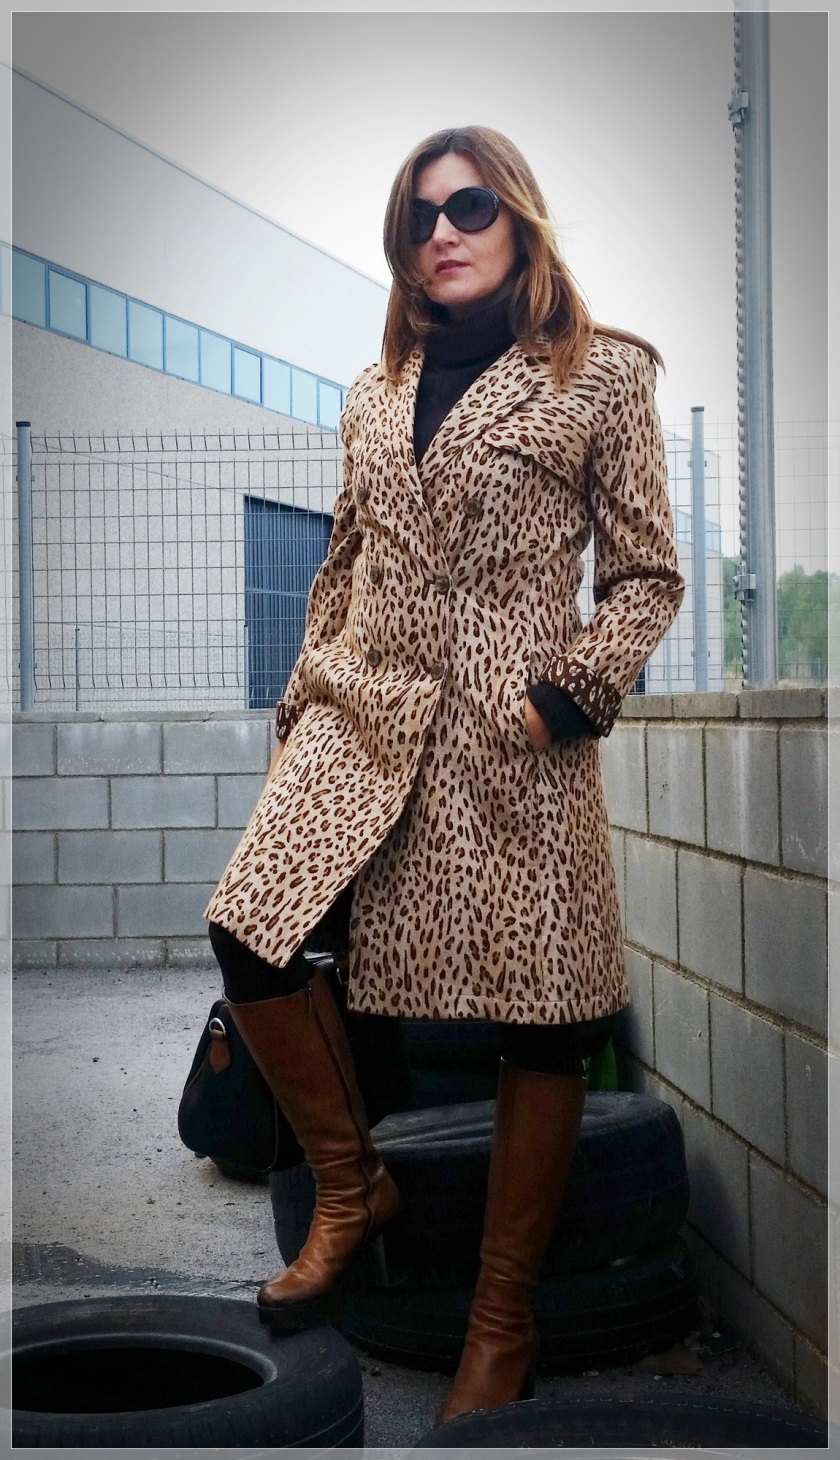 Cuida de ti, Cuida tu imagen, Looks de invierno, Working looks, street style, winter trends 5